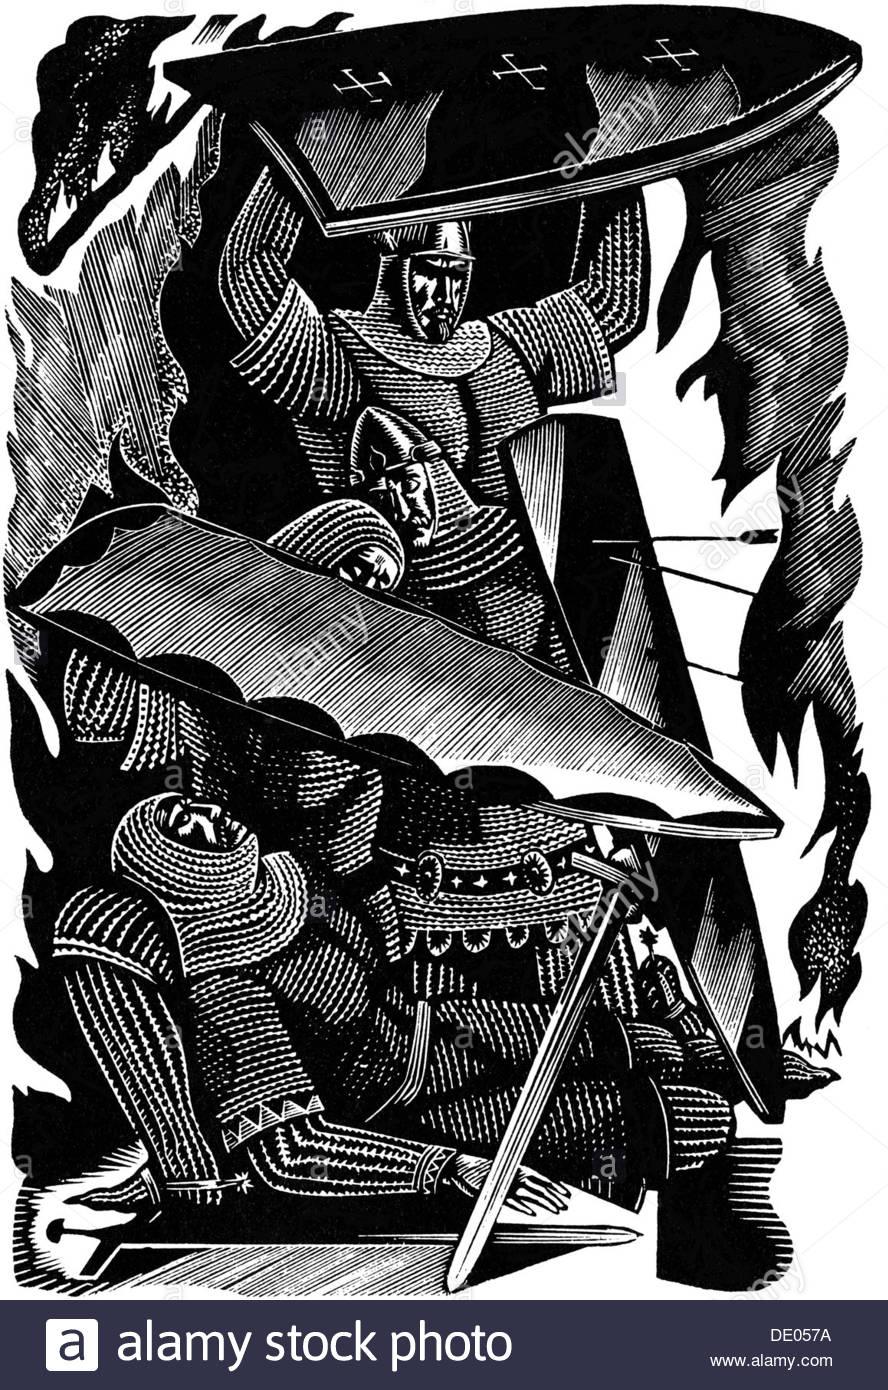 Illustration from the English epic poem Beowulf, 1975.  Artist: Vladimir Noskov - Stock Image